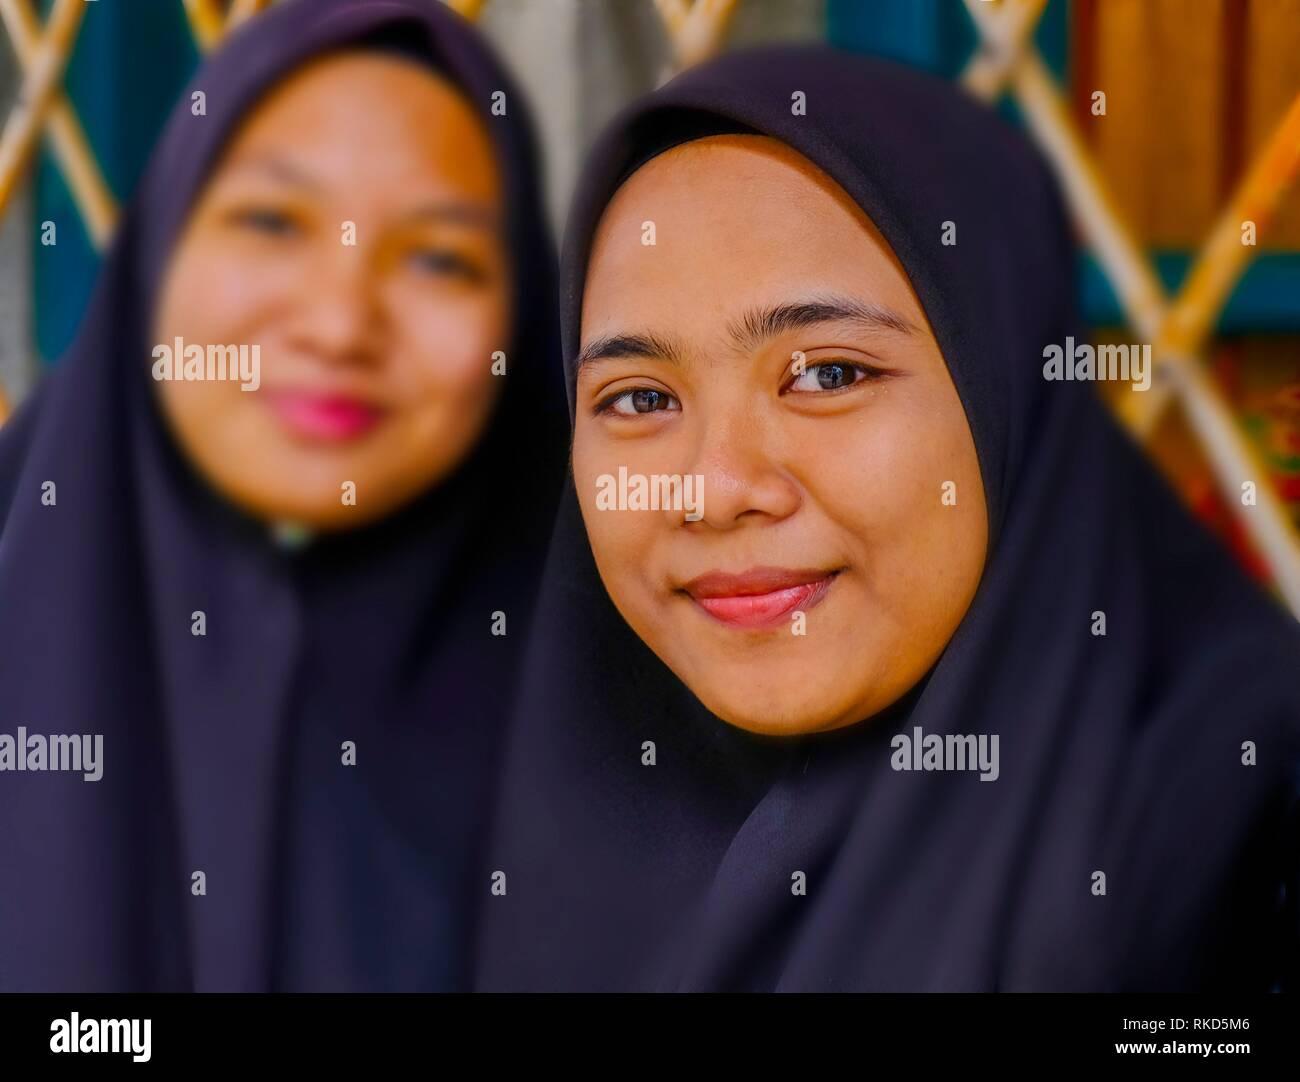 Malaysia, Penang. George town, muslim girls. - Stock Image